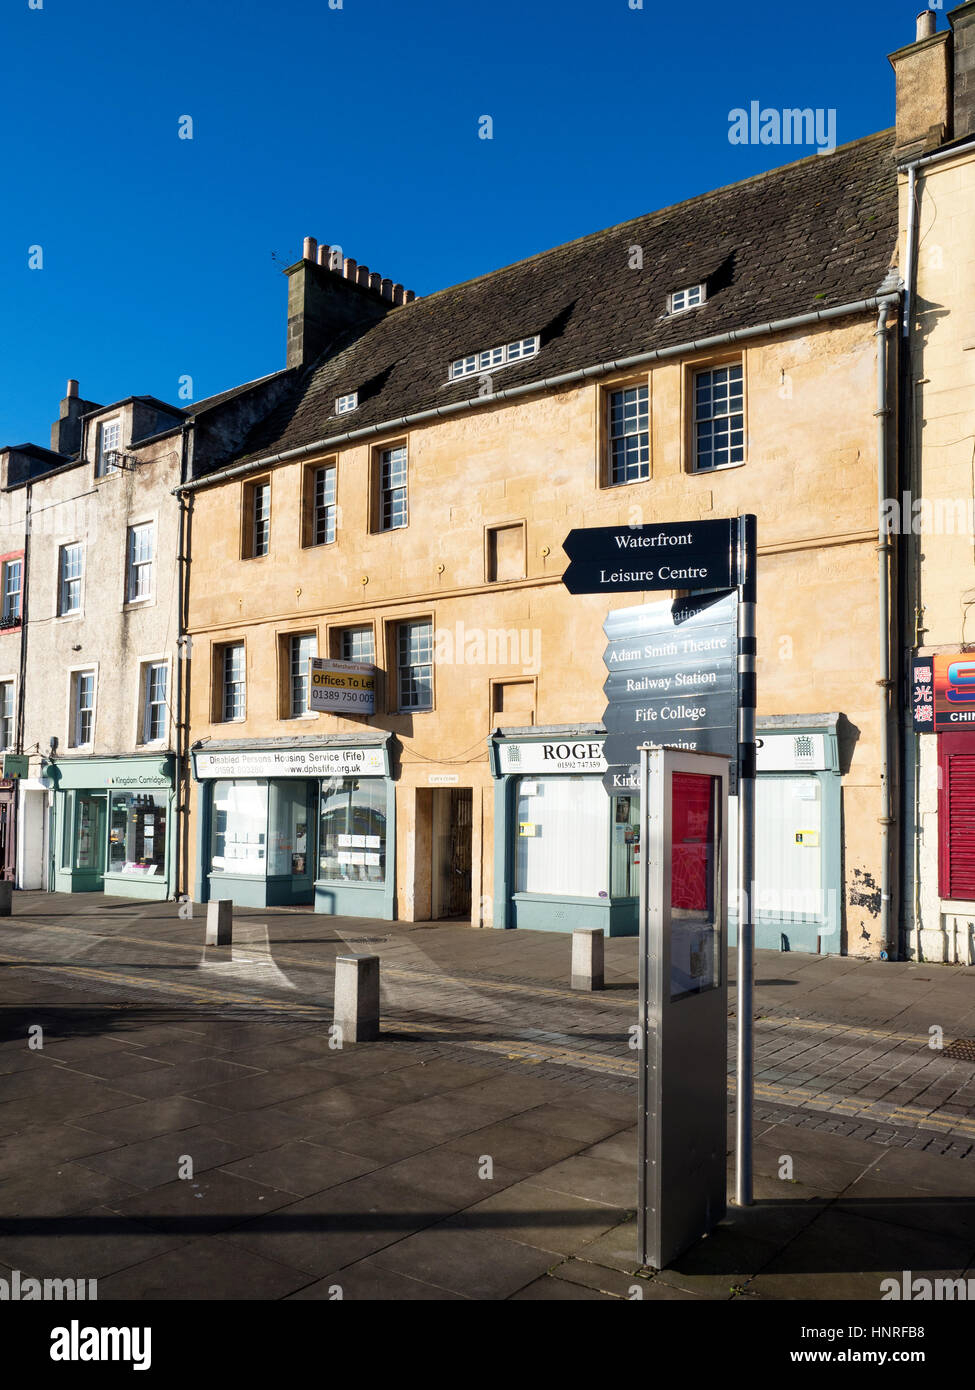 The Merchants House Historic Building in Kirkcaldy Fife Scotland - Stock Image